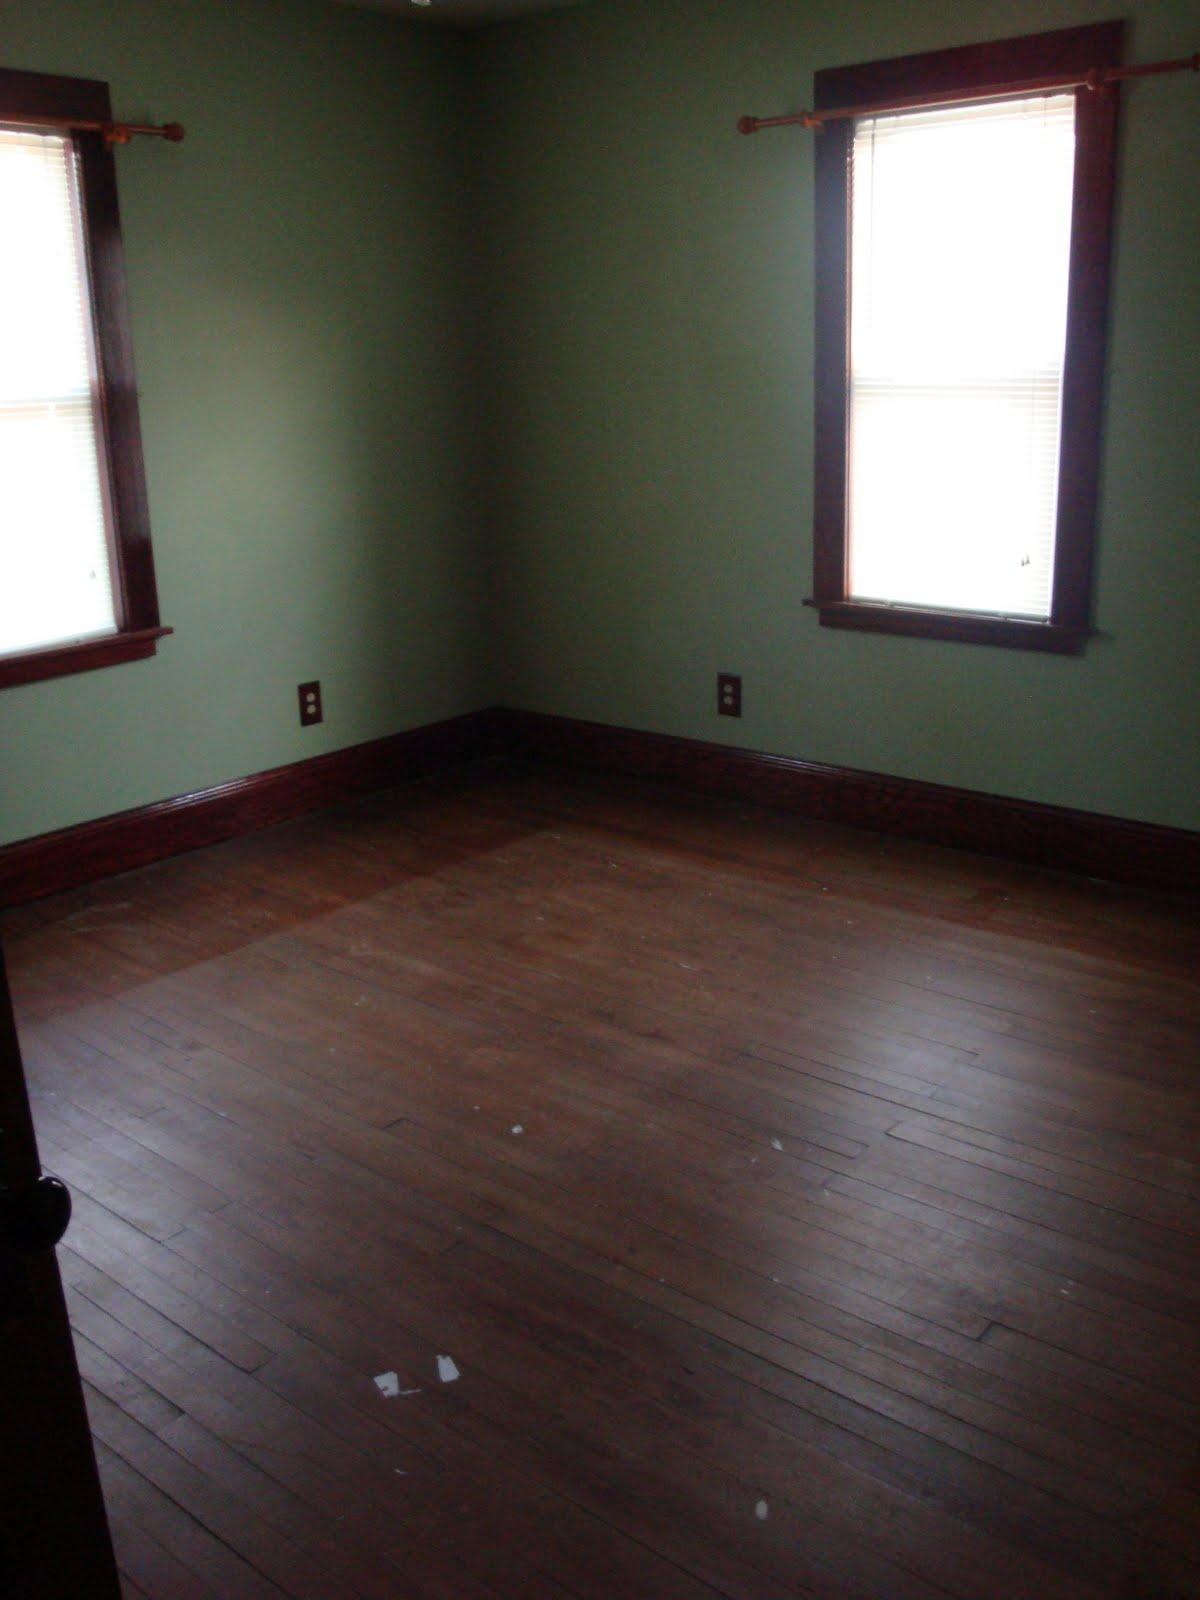 Dark Wood Doors And Floors With White Trim Wood Floors